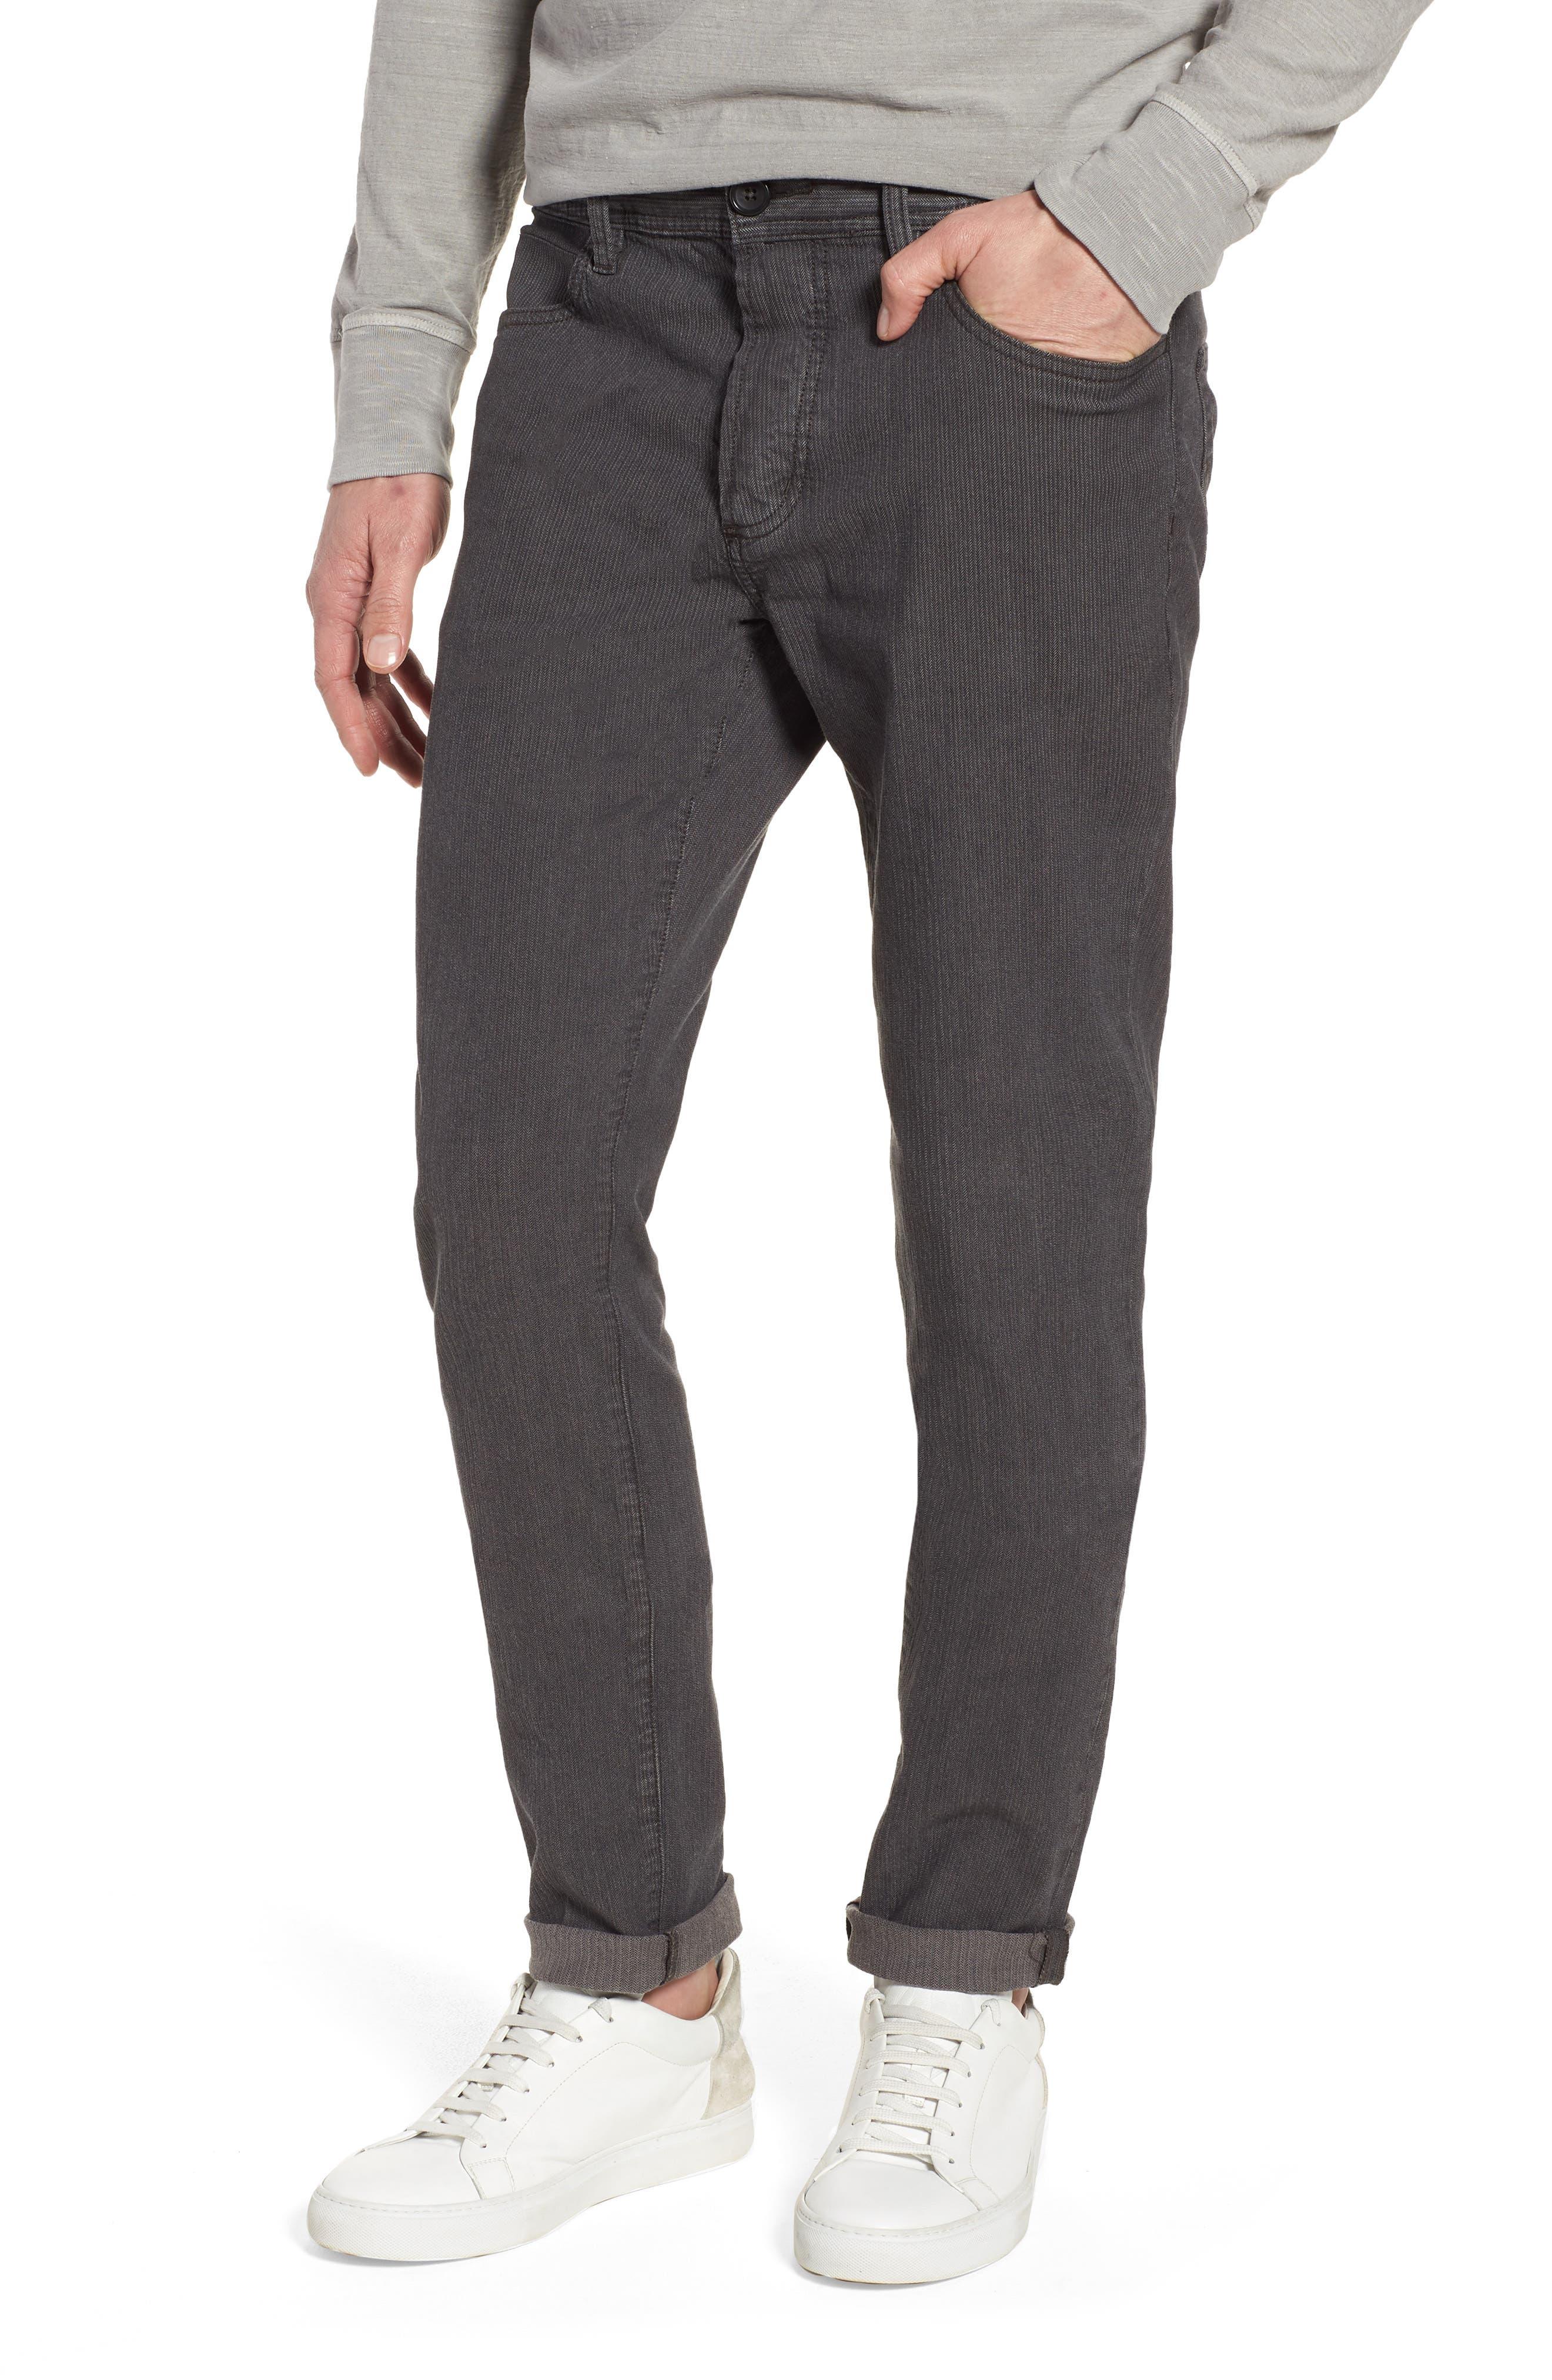 Alternate Image 1 Selected - James Perse Slim Fit Stretch Herringbone Pants